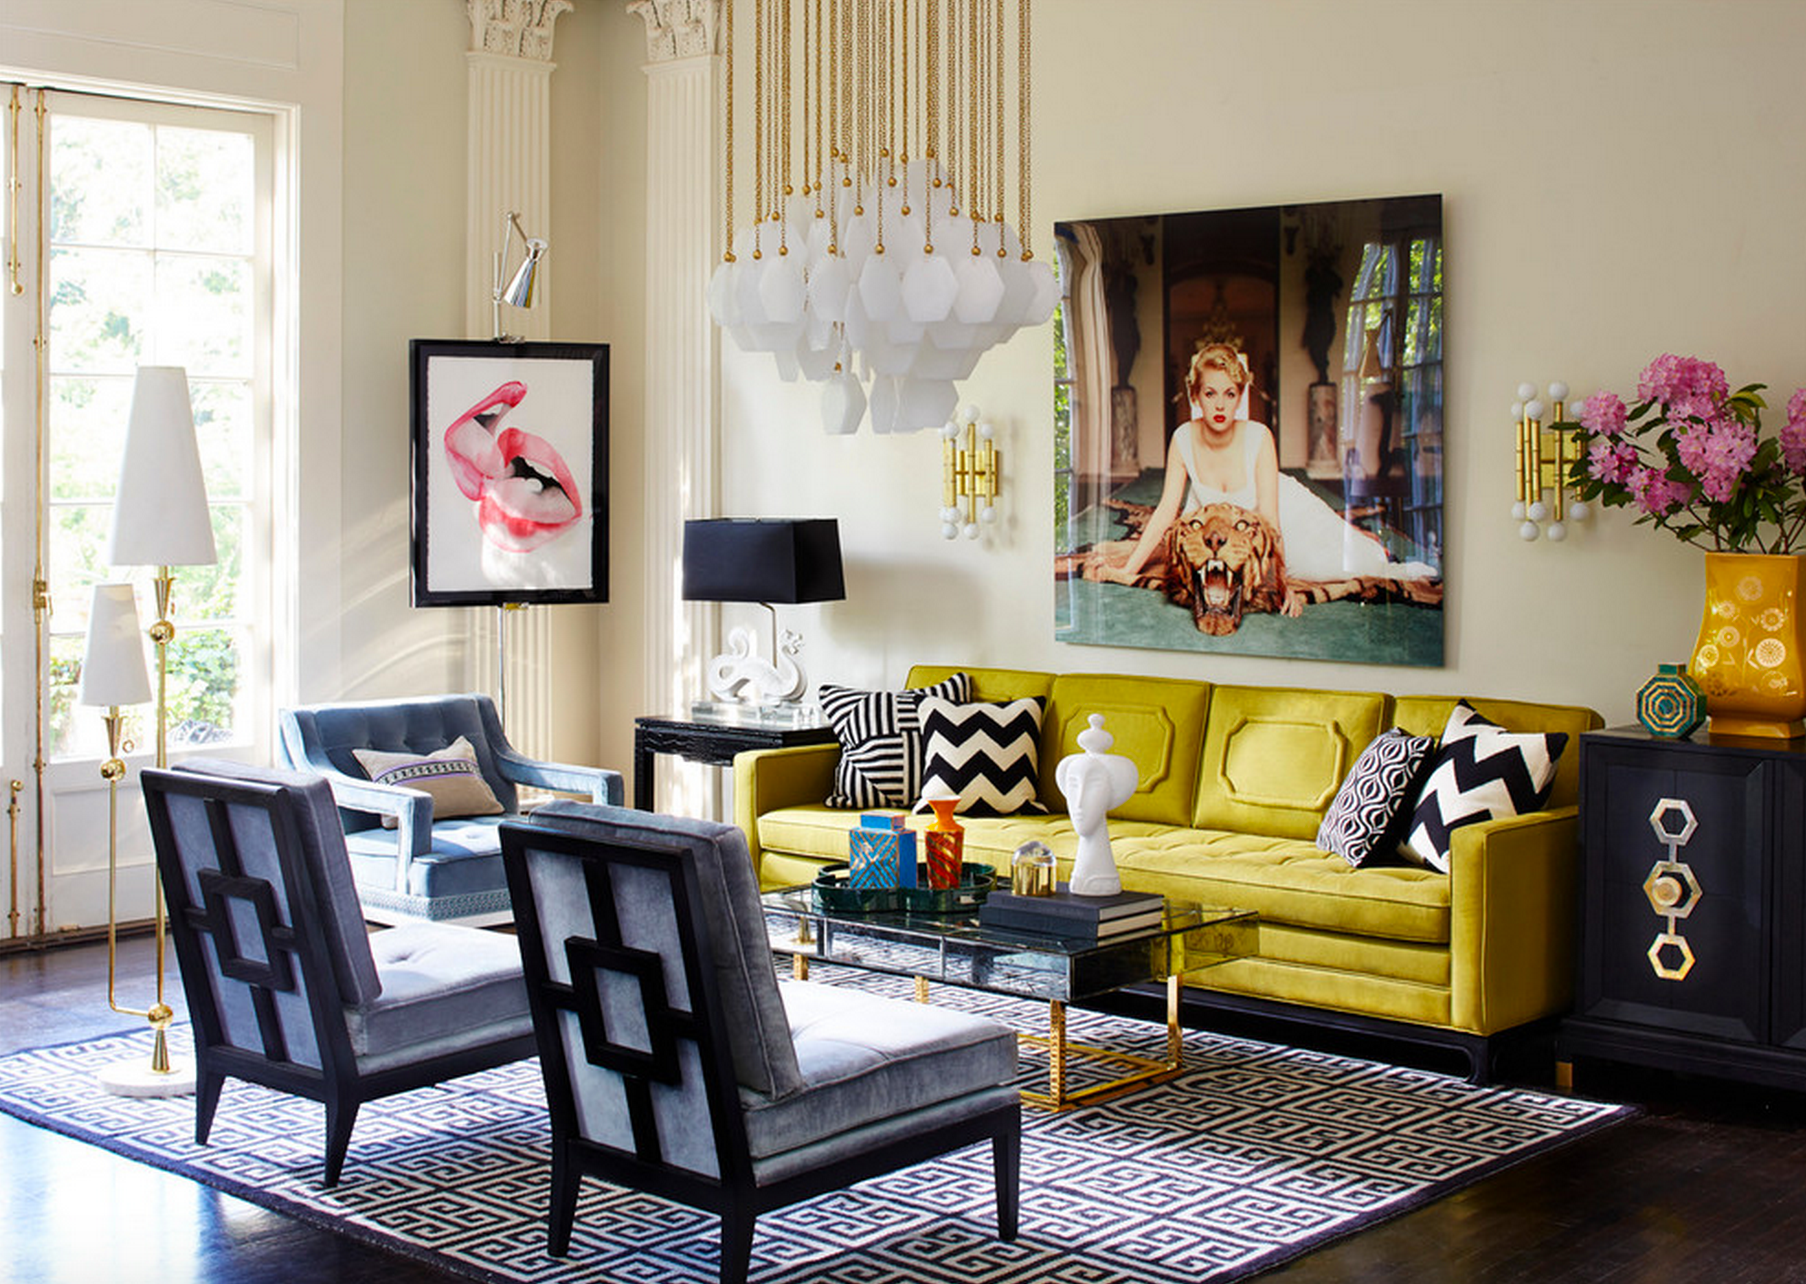 15 Beautiful Living Room Lighting Ideas Electrical Installation Upgrade Importance Home Design Diy